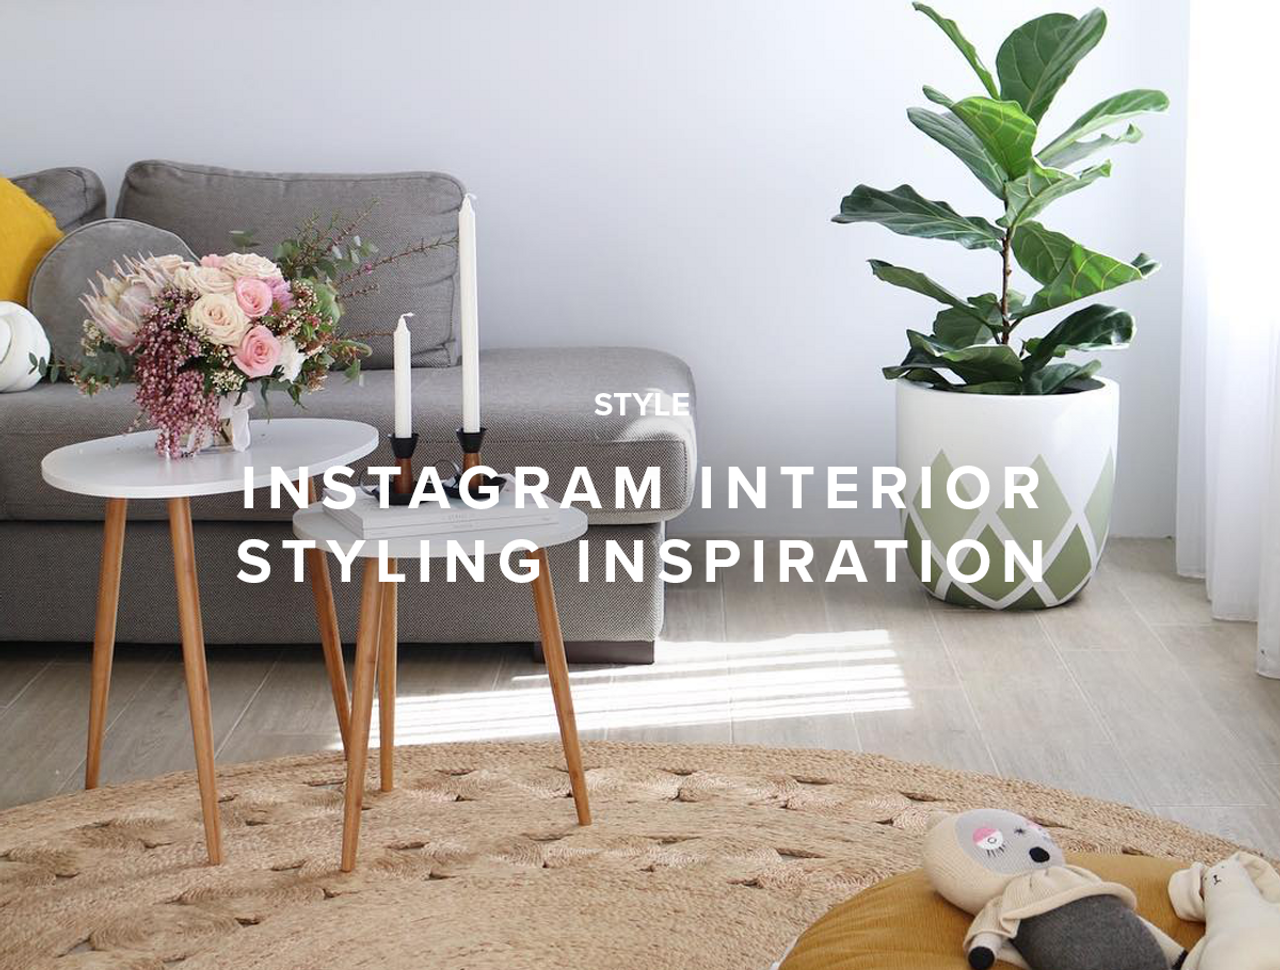 Instagram Interior Styling Inspiration